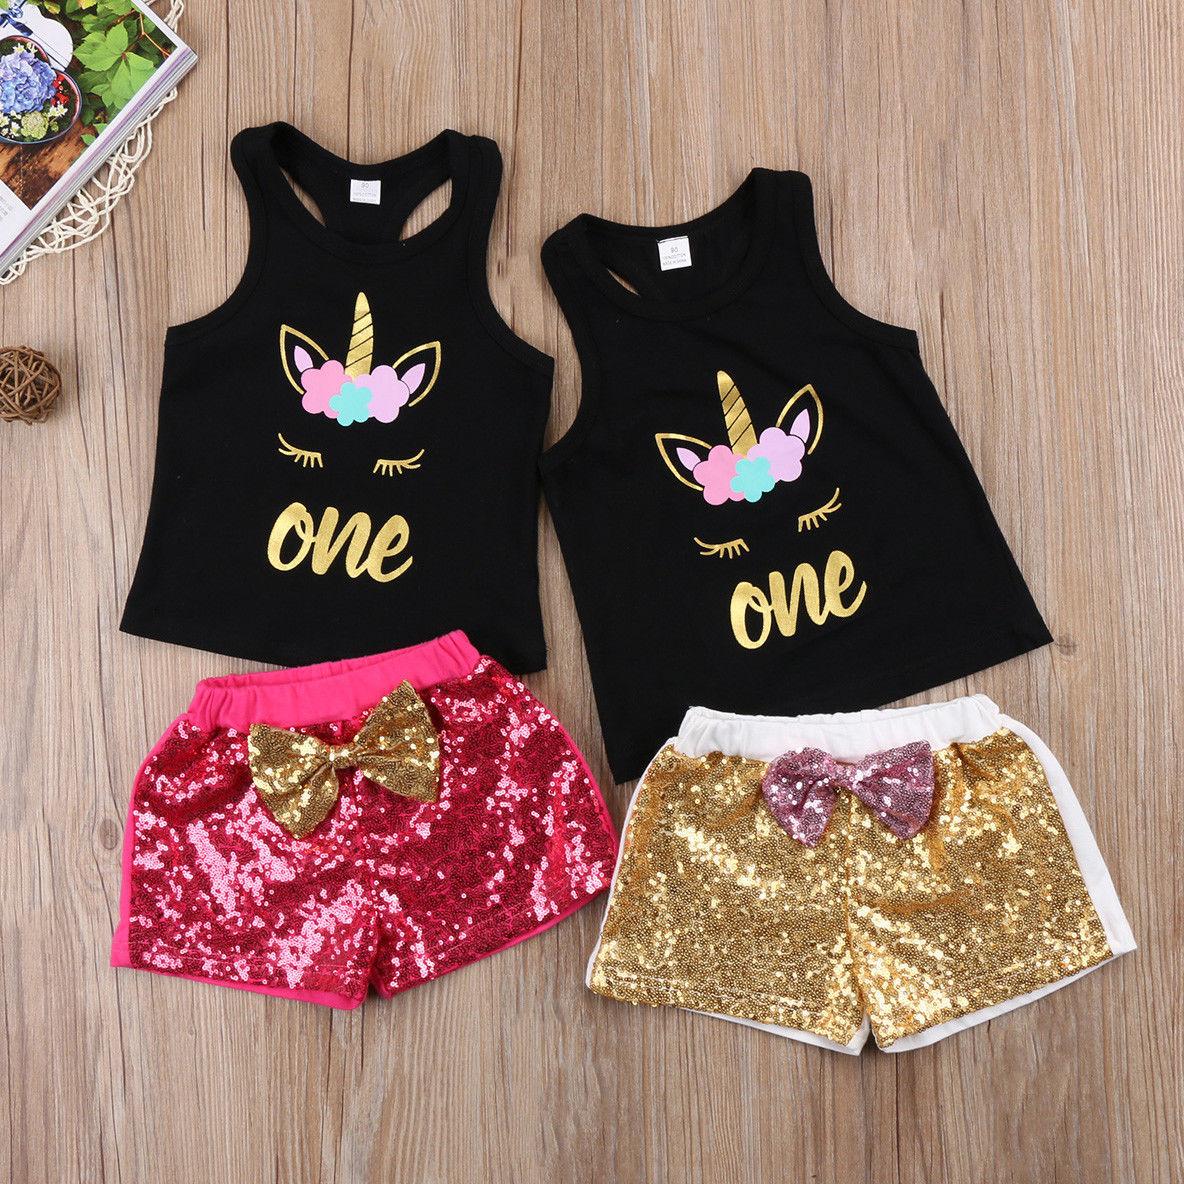 Emmababy Zomer Peuter Kids Baby Meisjes Kleding Eenhoorn T-shirt Tops Shorts Pailletten Baby 2 STUKS Outfits Baby Kleding Leuke Set